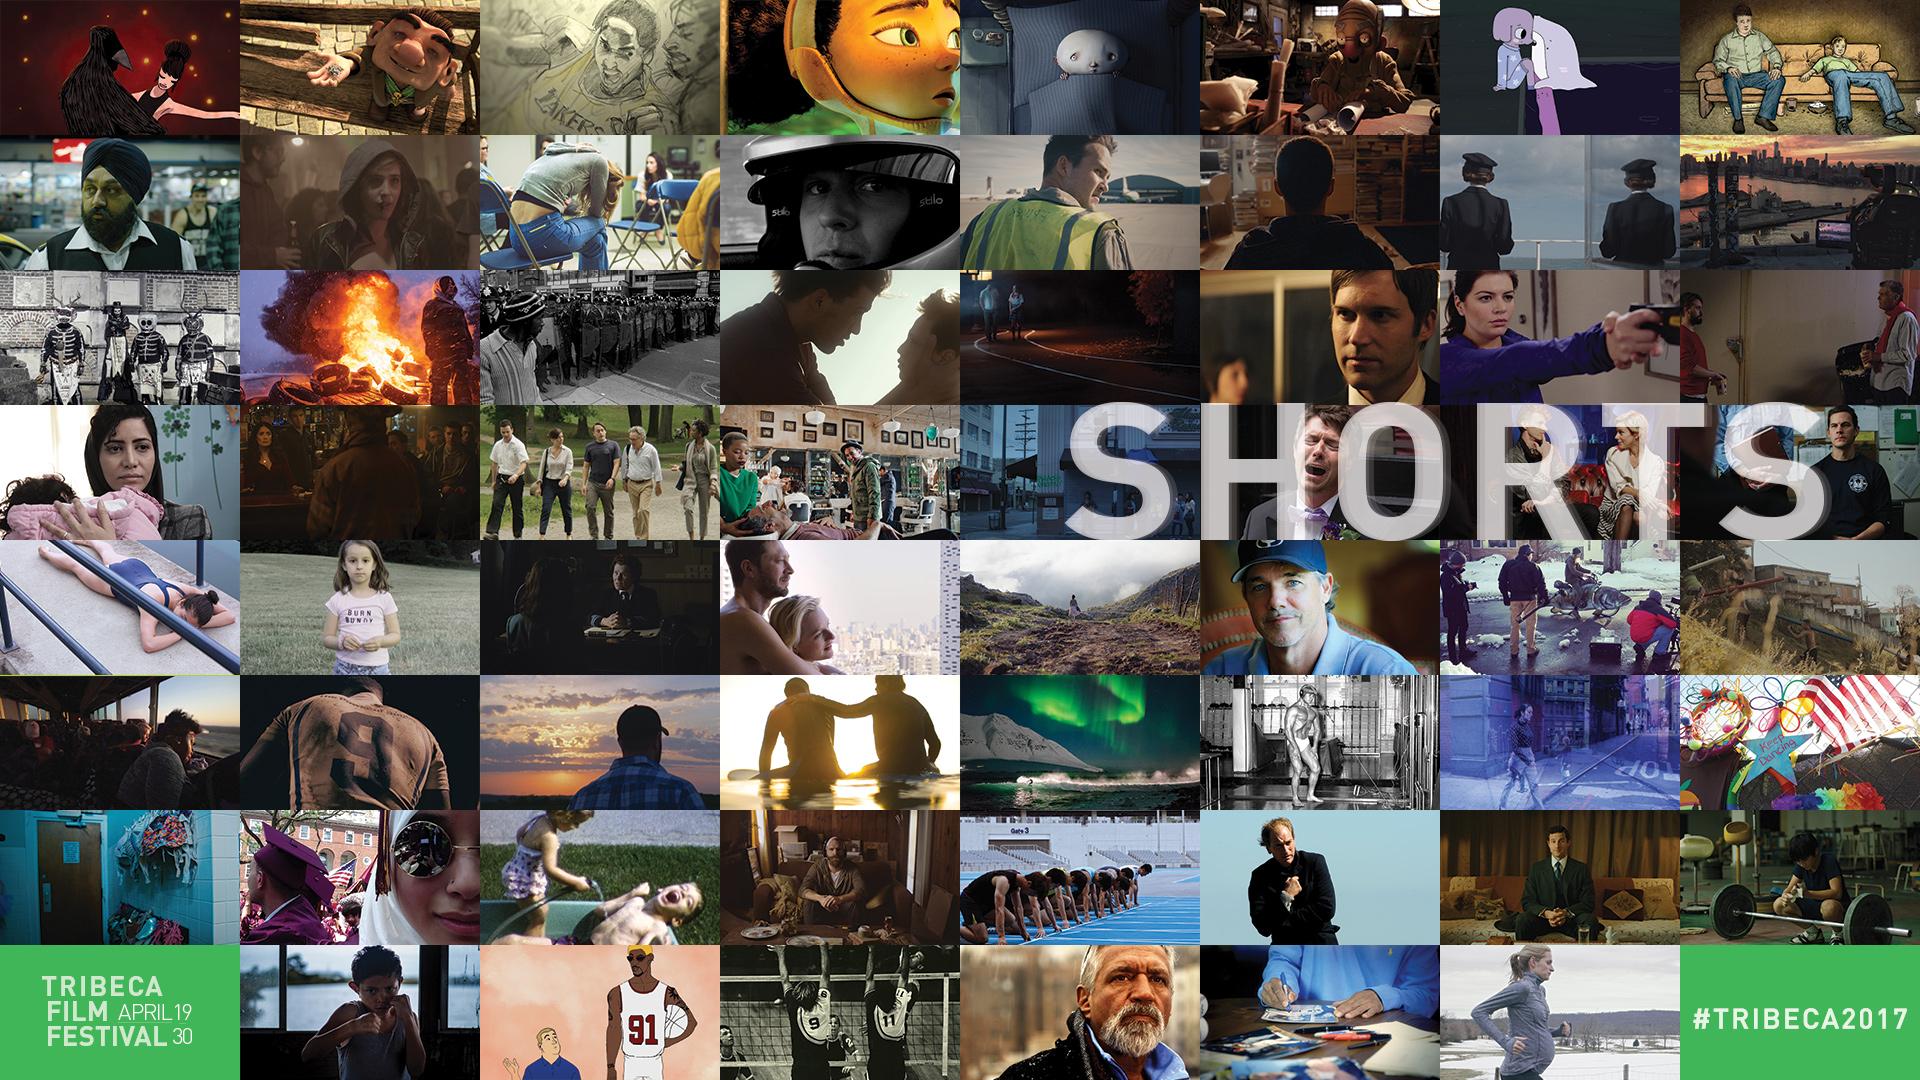 Tribeca Film Festival Short